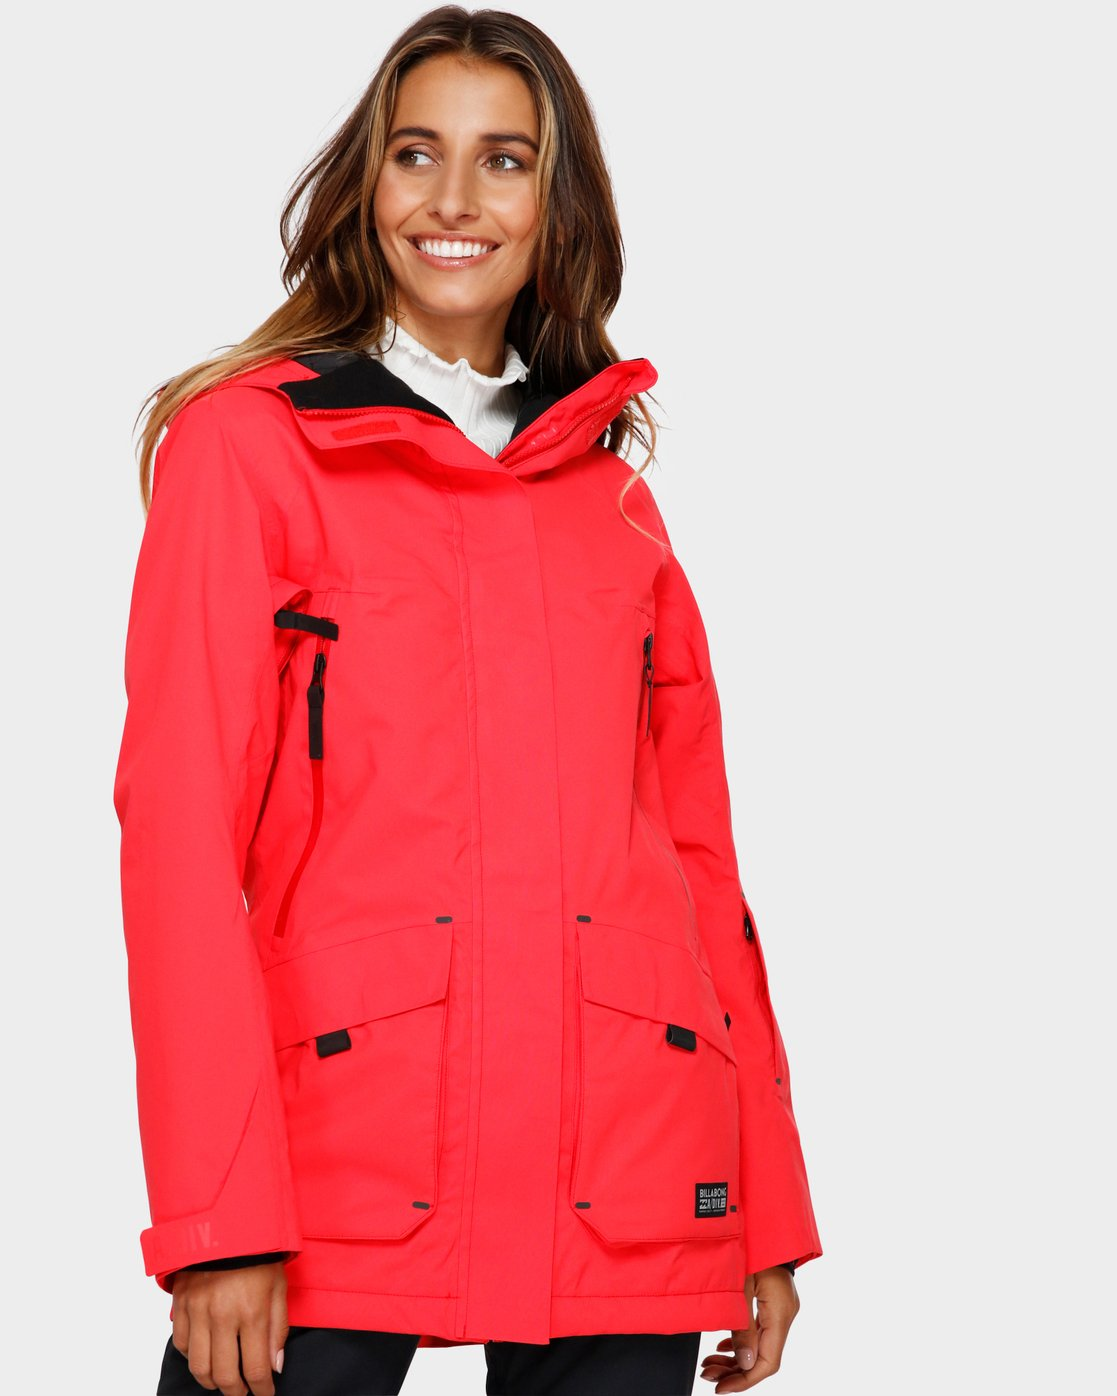 Billabong Women/'s Trooper Snow Jacket Black XS Choose SZ//color